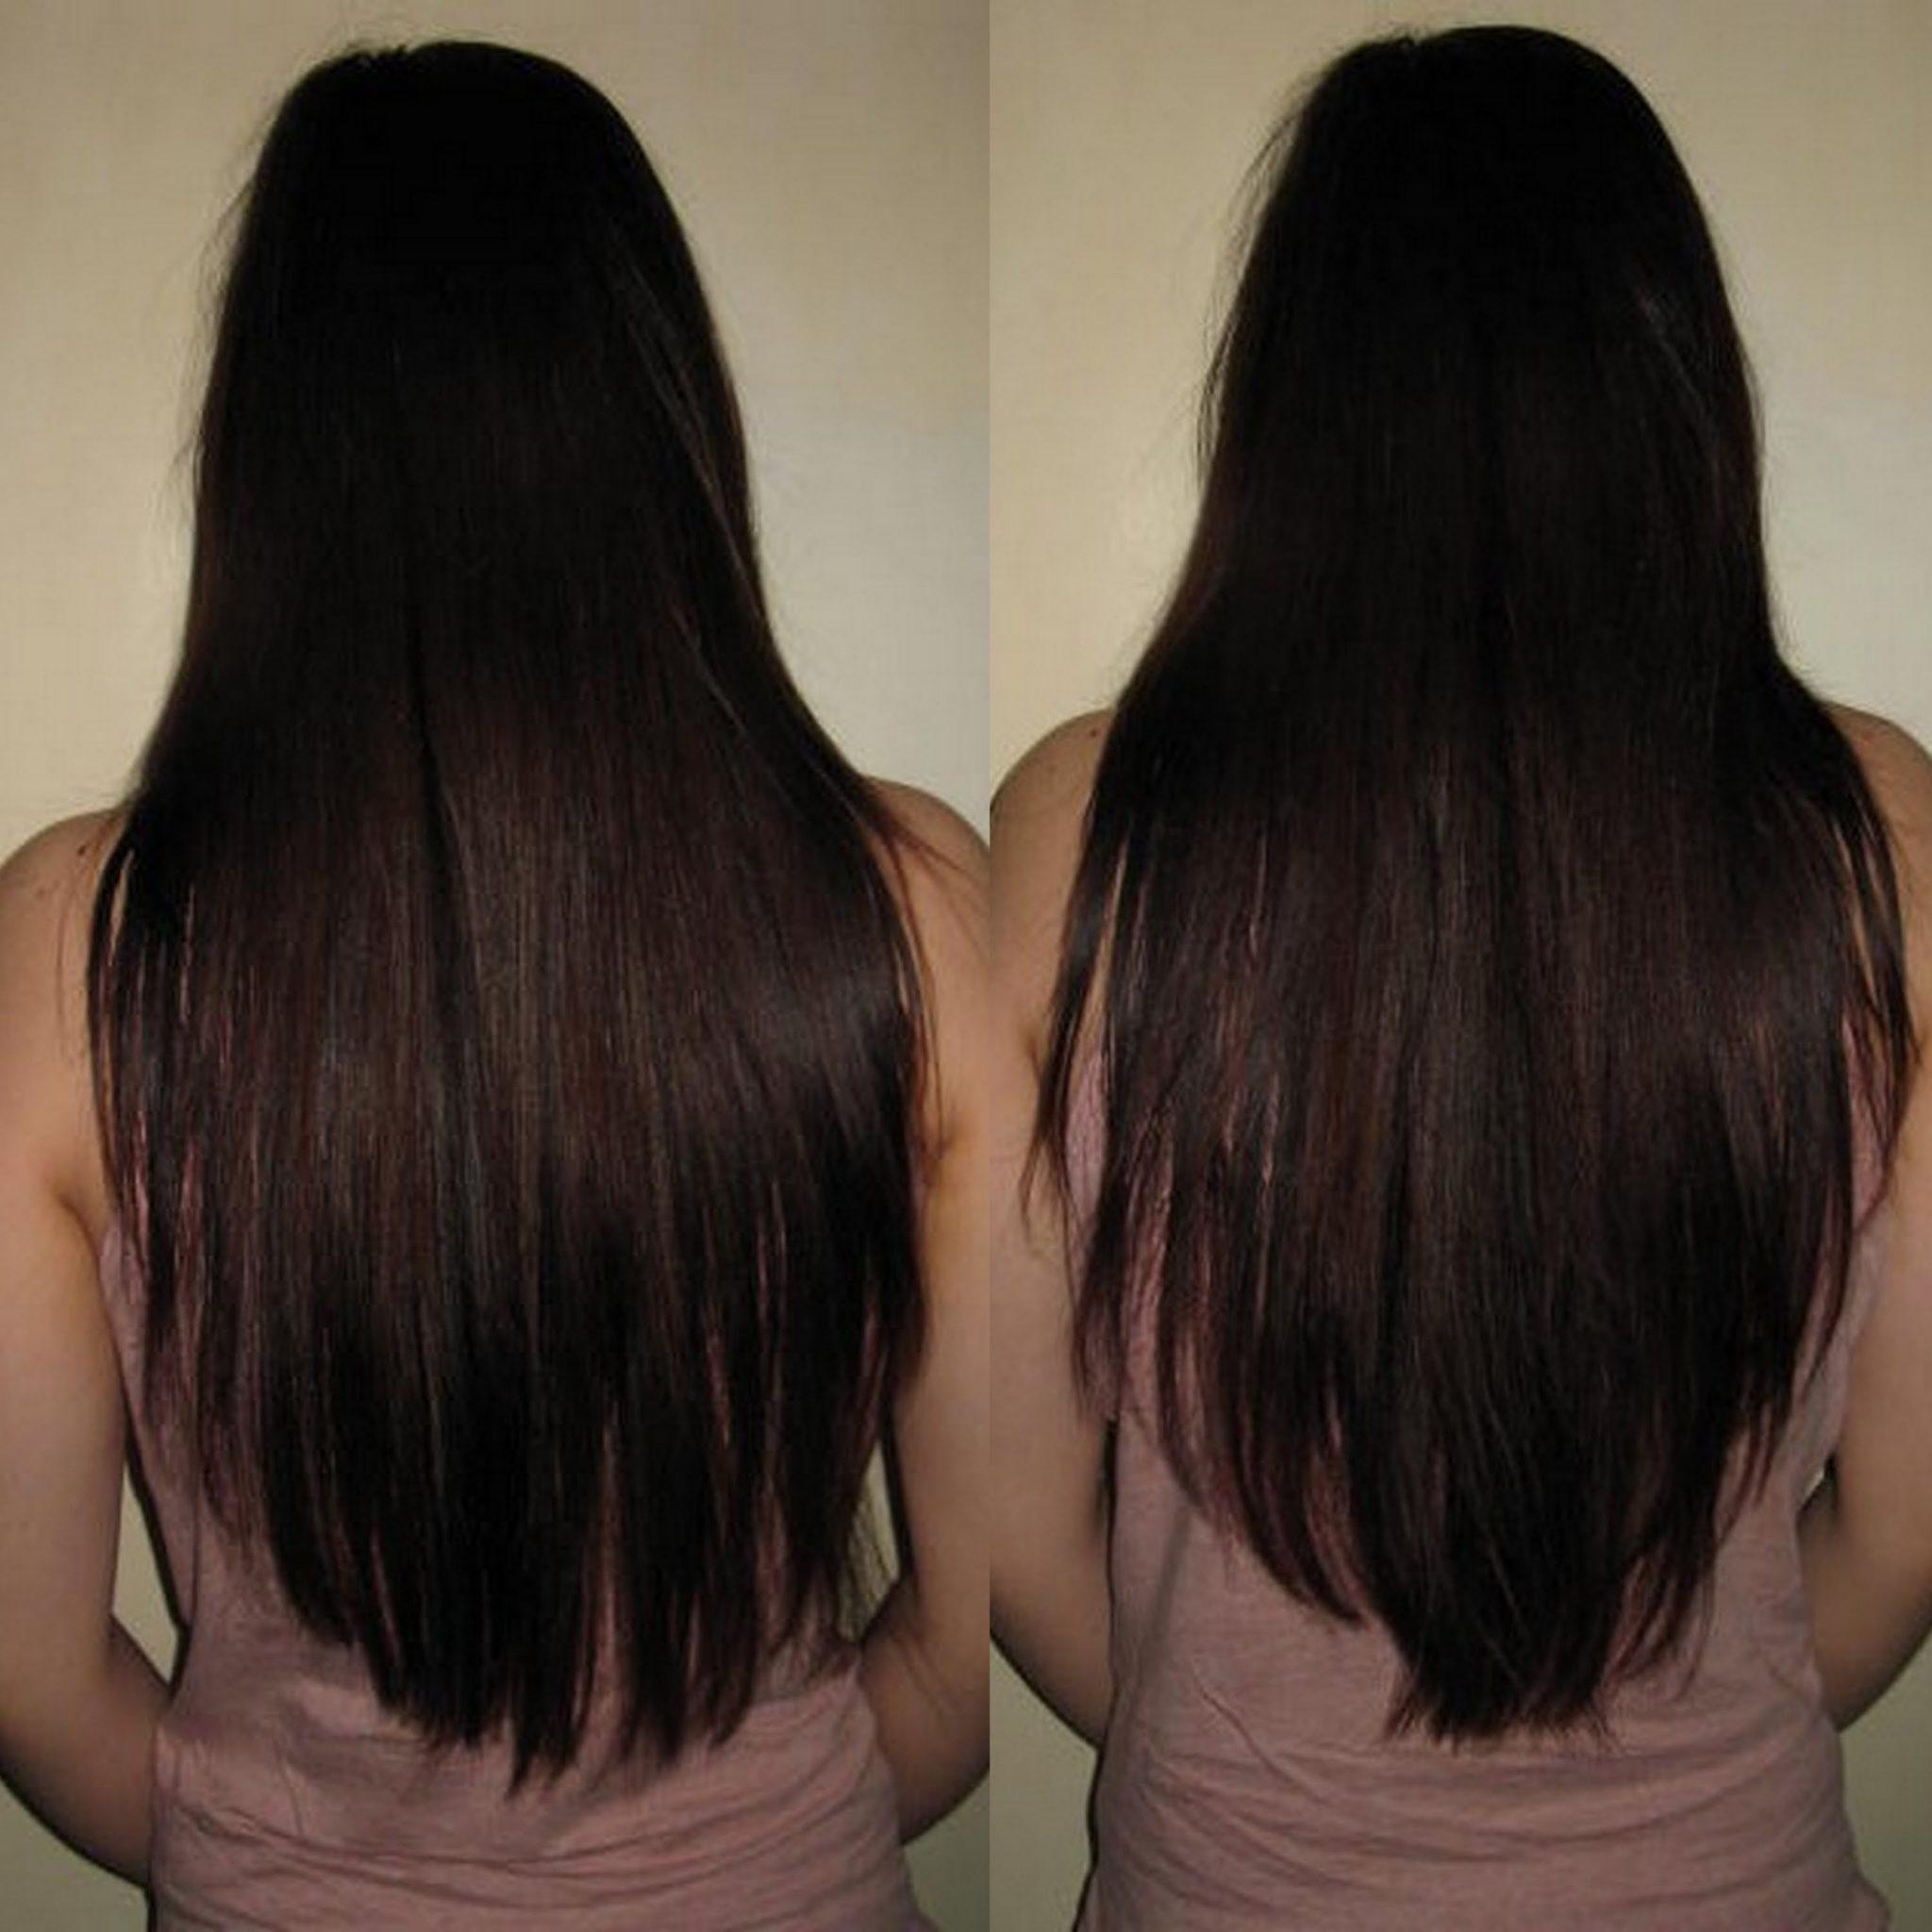 comment rendre ses cheveux lisses naturellement salon making of. Black Bedroom Furniture Sets. Home Design Ideas